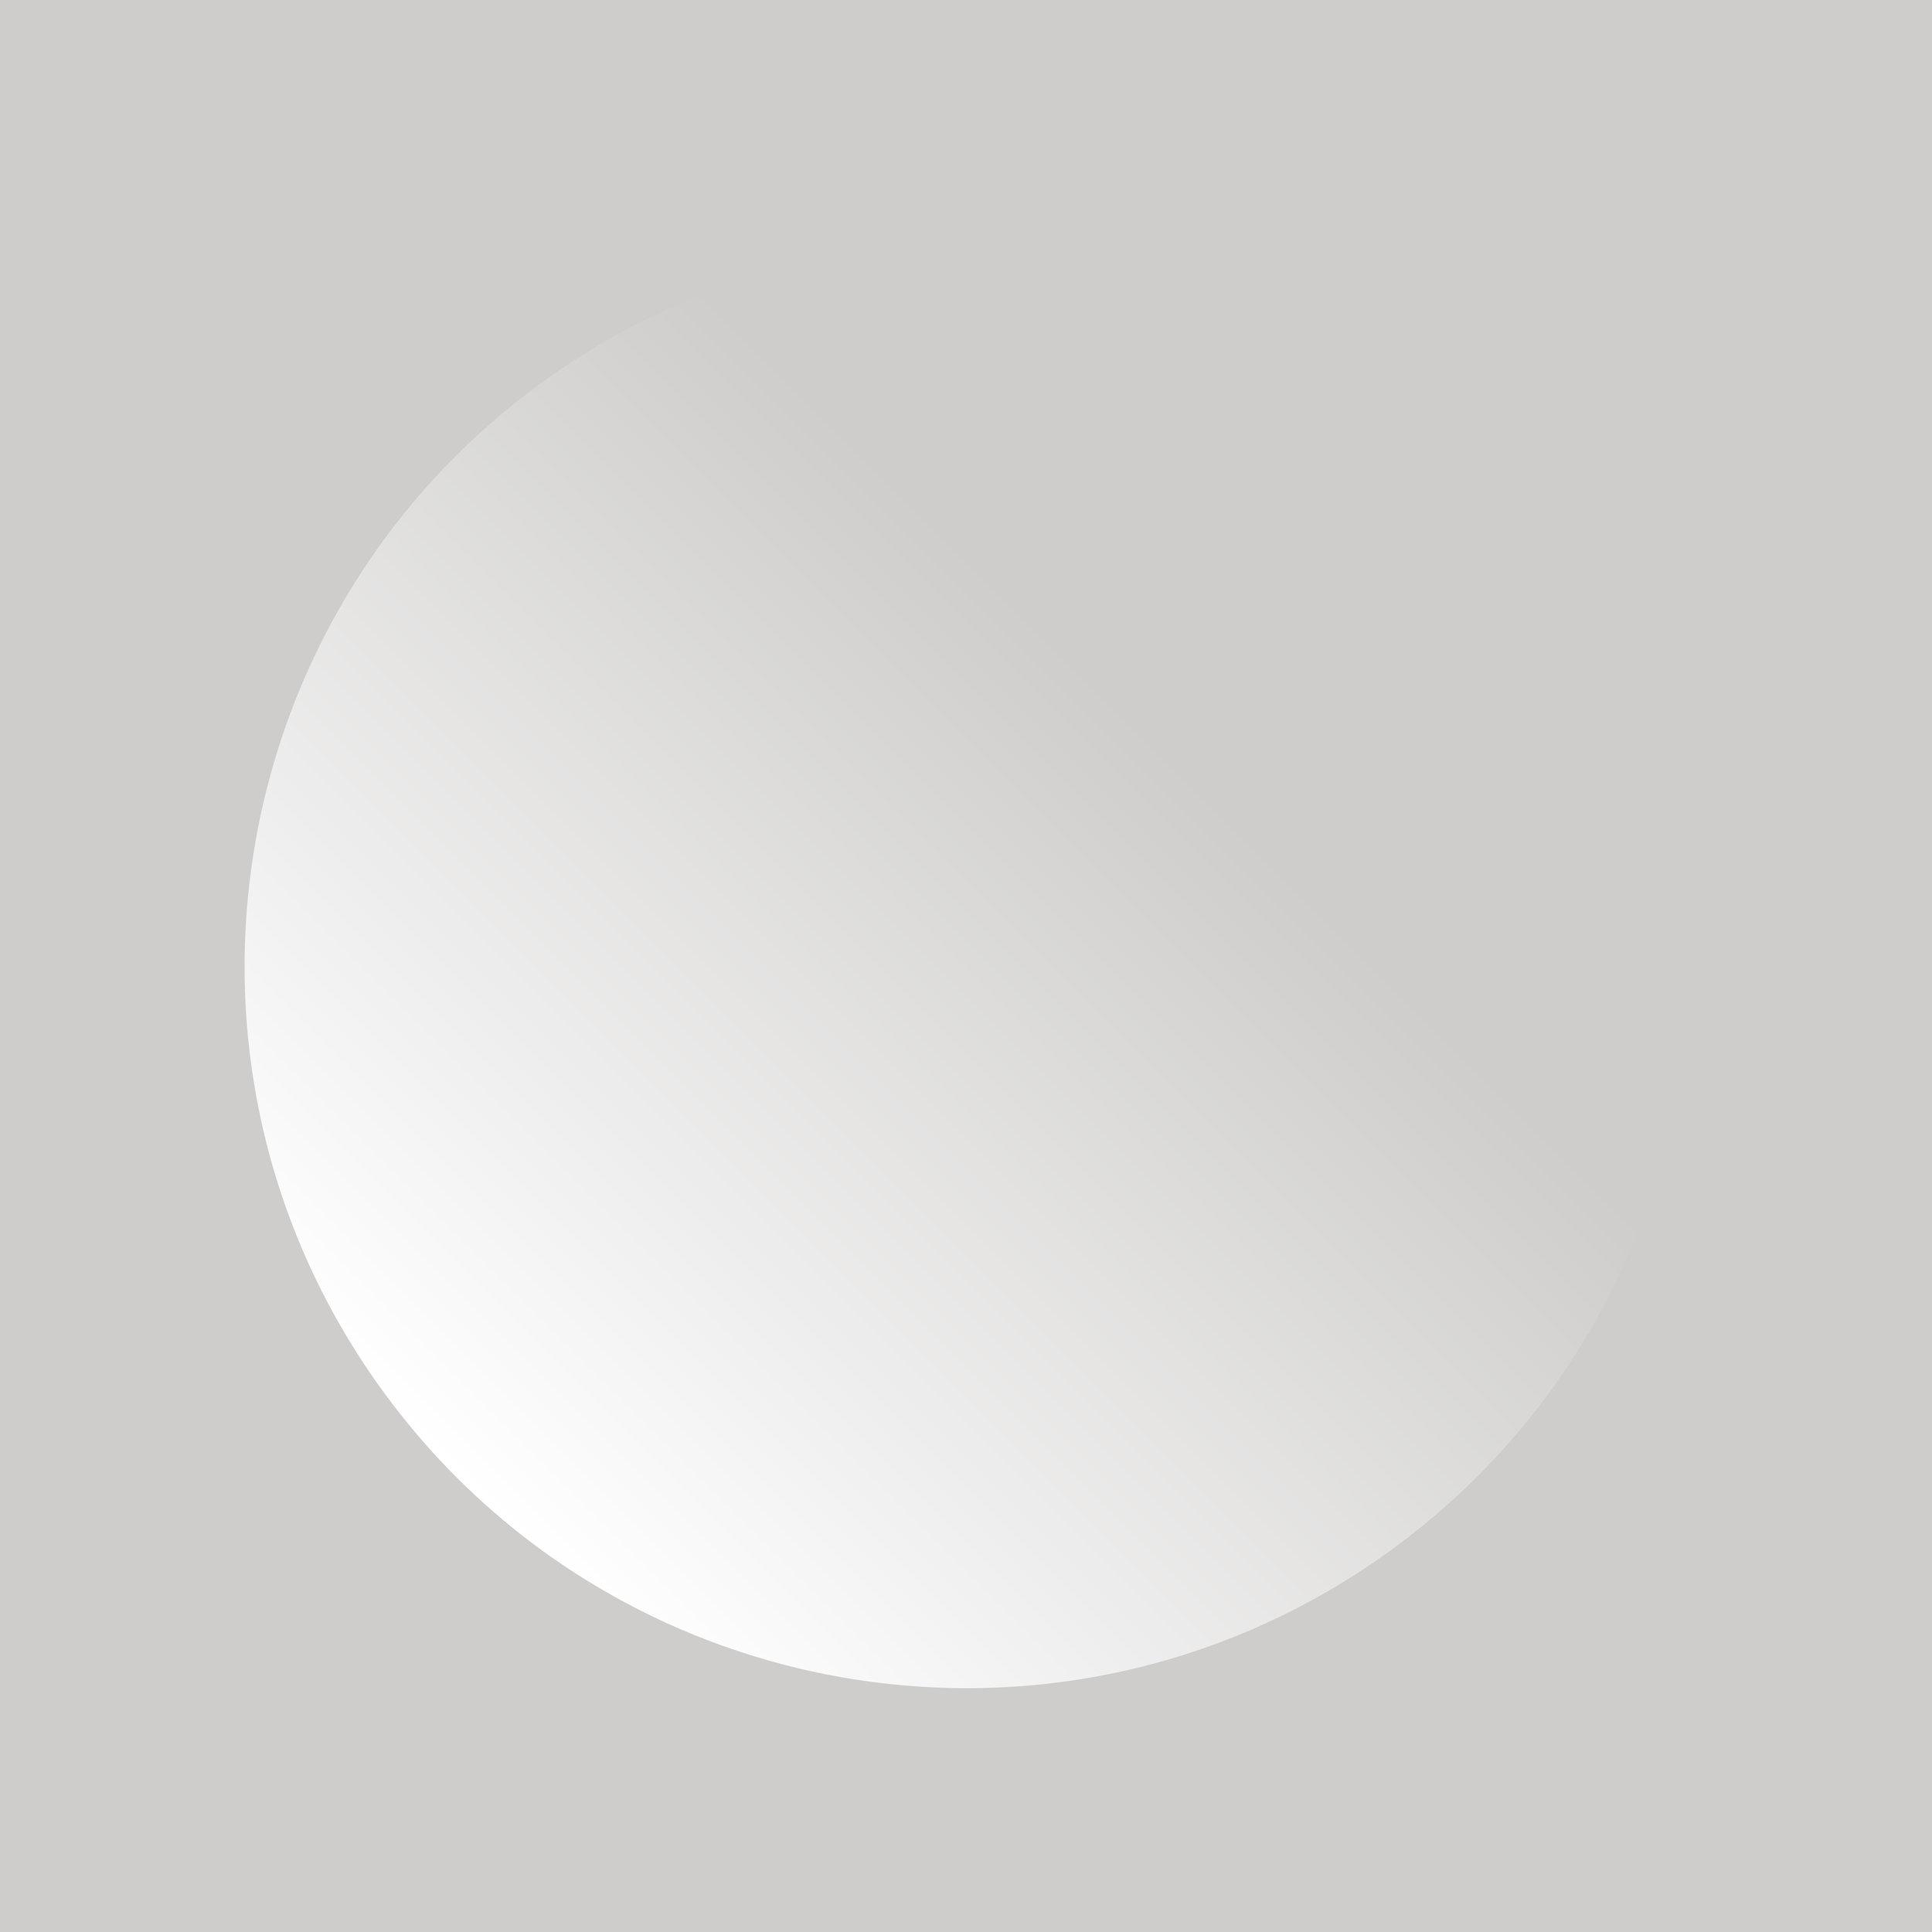 Pattern-24.jpg